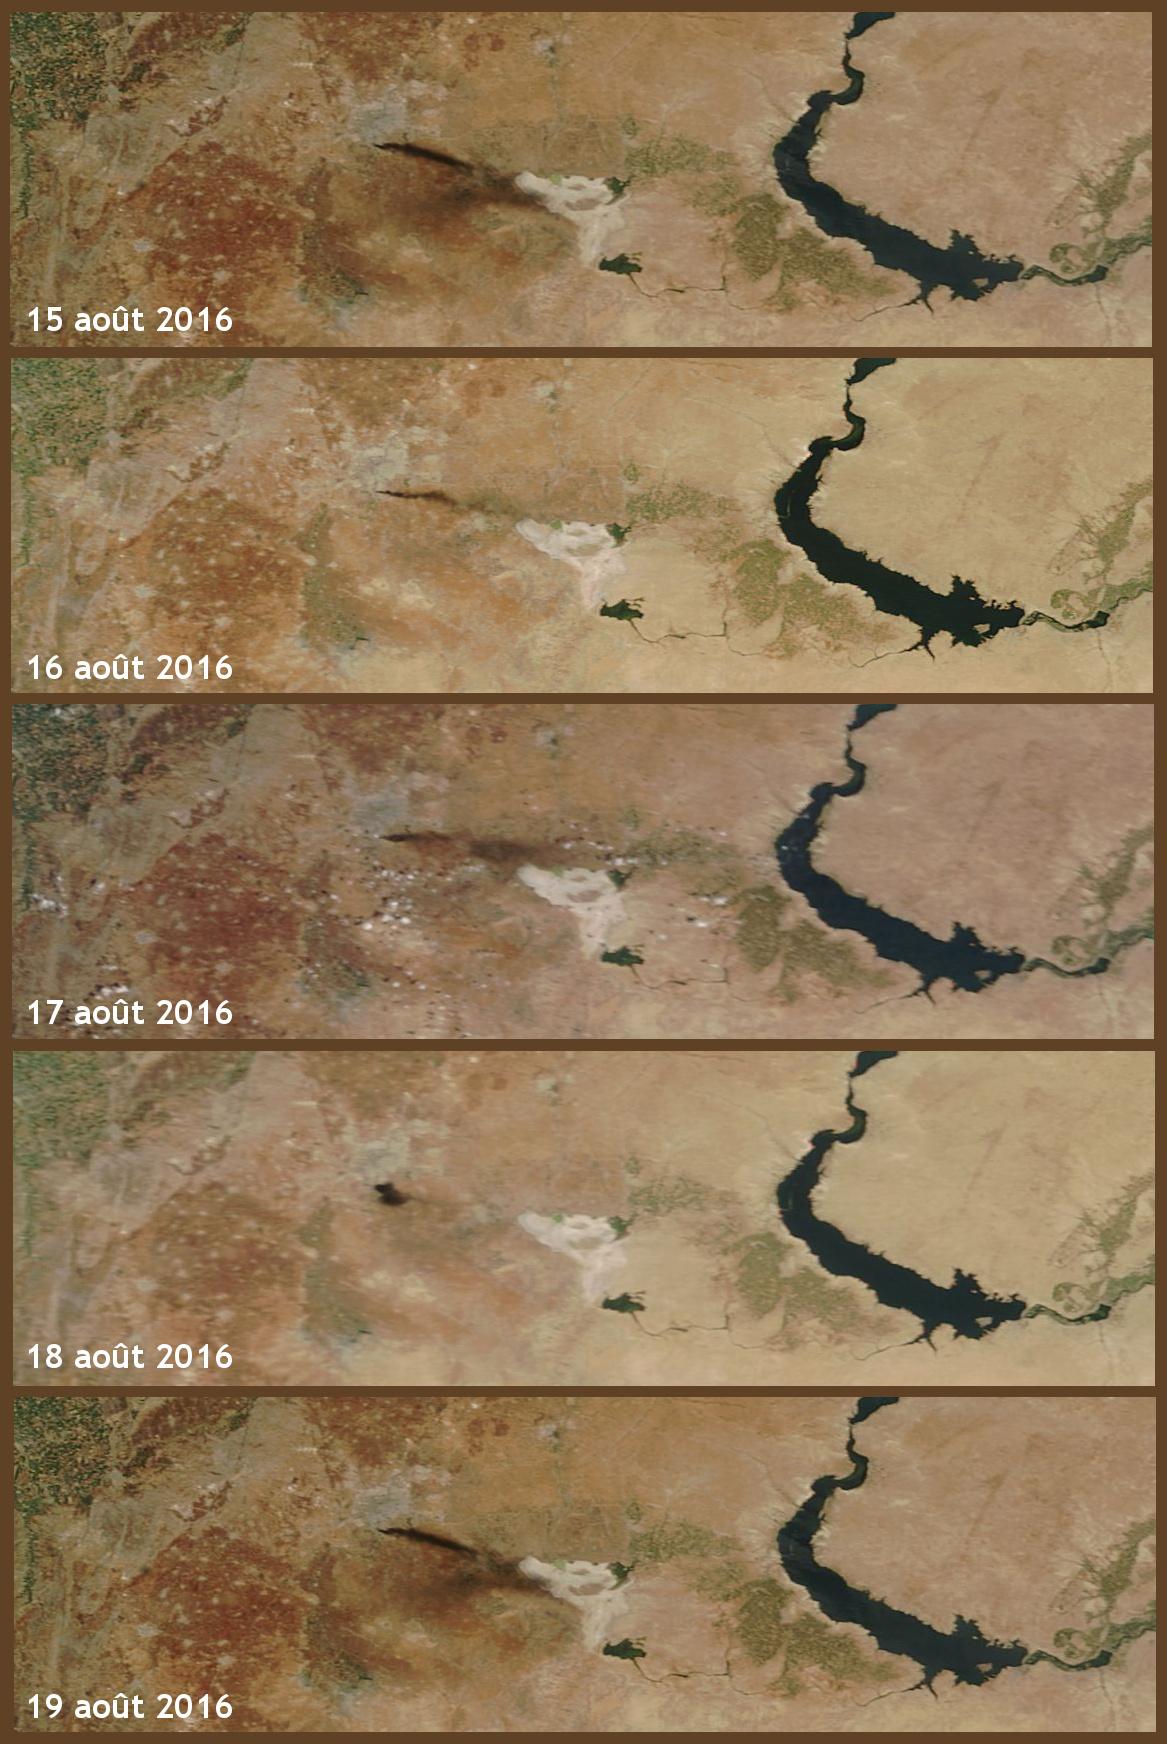 Syrie - Alep - Aleppo - Siège Bombardements - Raid aérien - rebelle - Omran - MODIS - Terra - NASA - 14 août 2016 - satellite - Worldview - EOSDIS